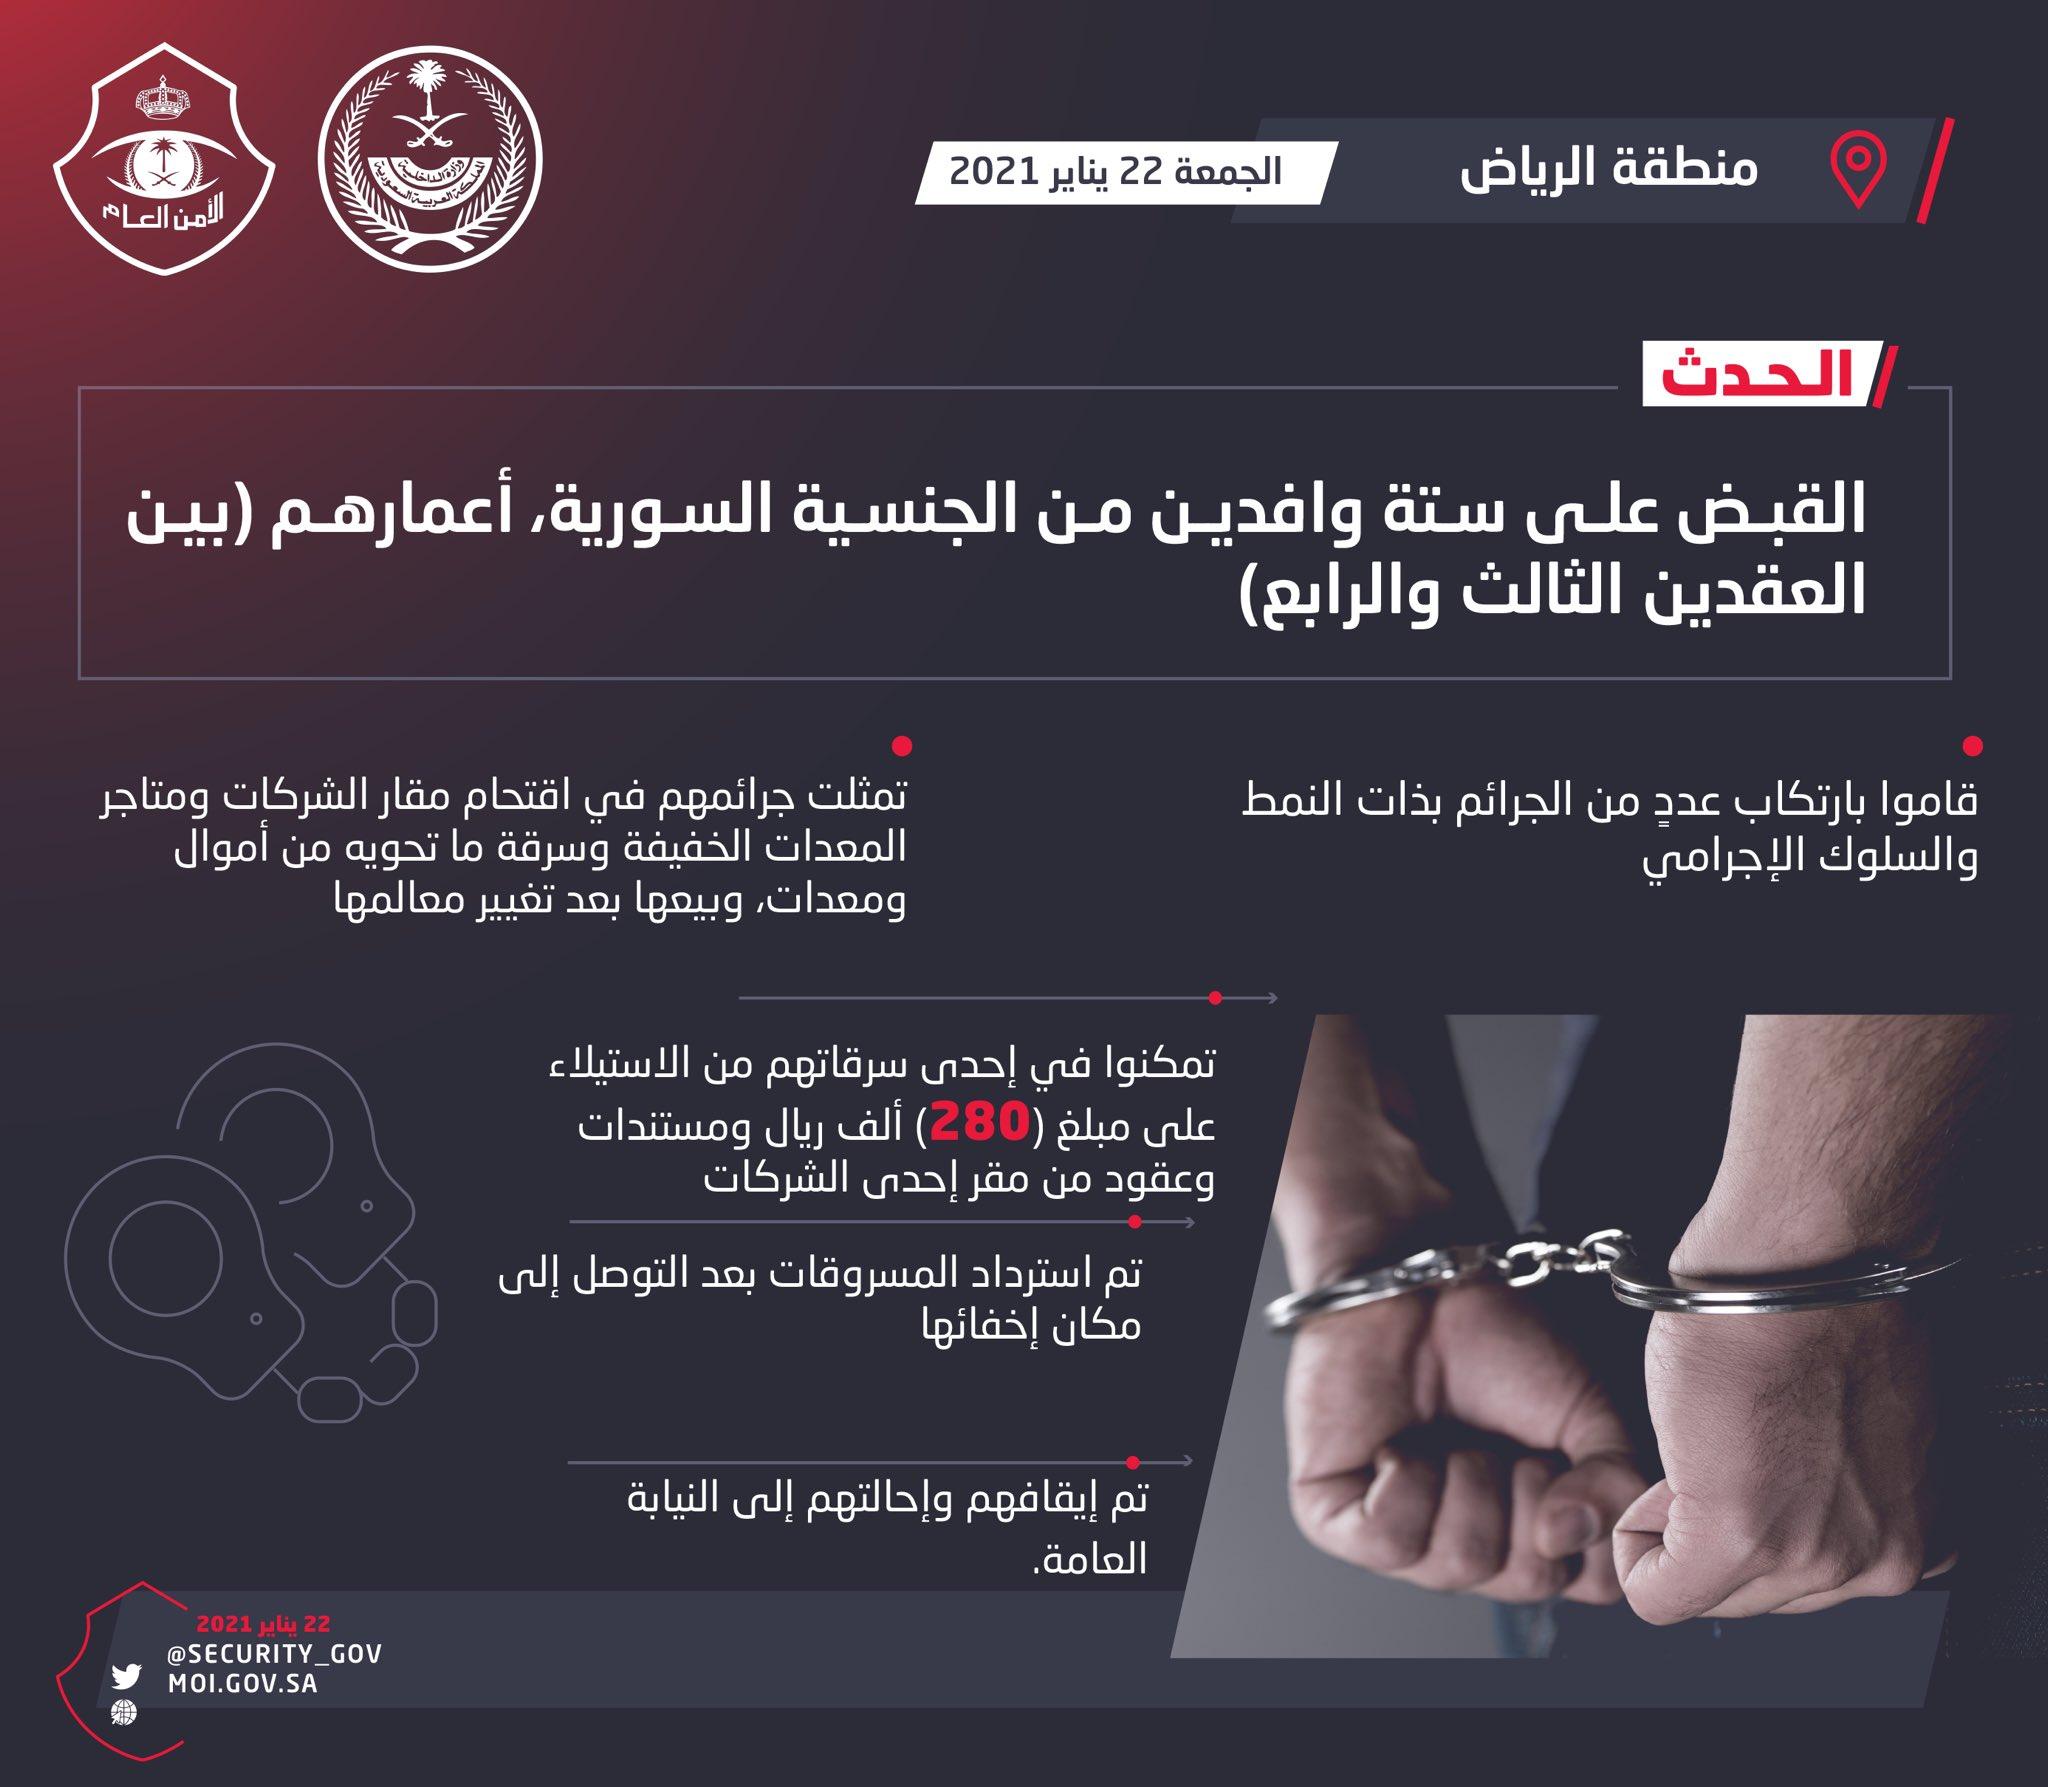 6 Expatriates arrested by Riyadh Police for theft - SAR 280,000